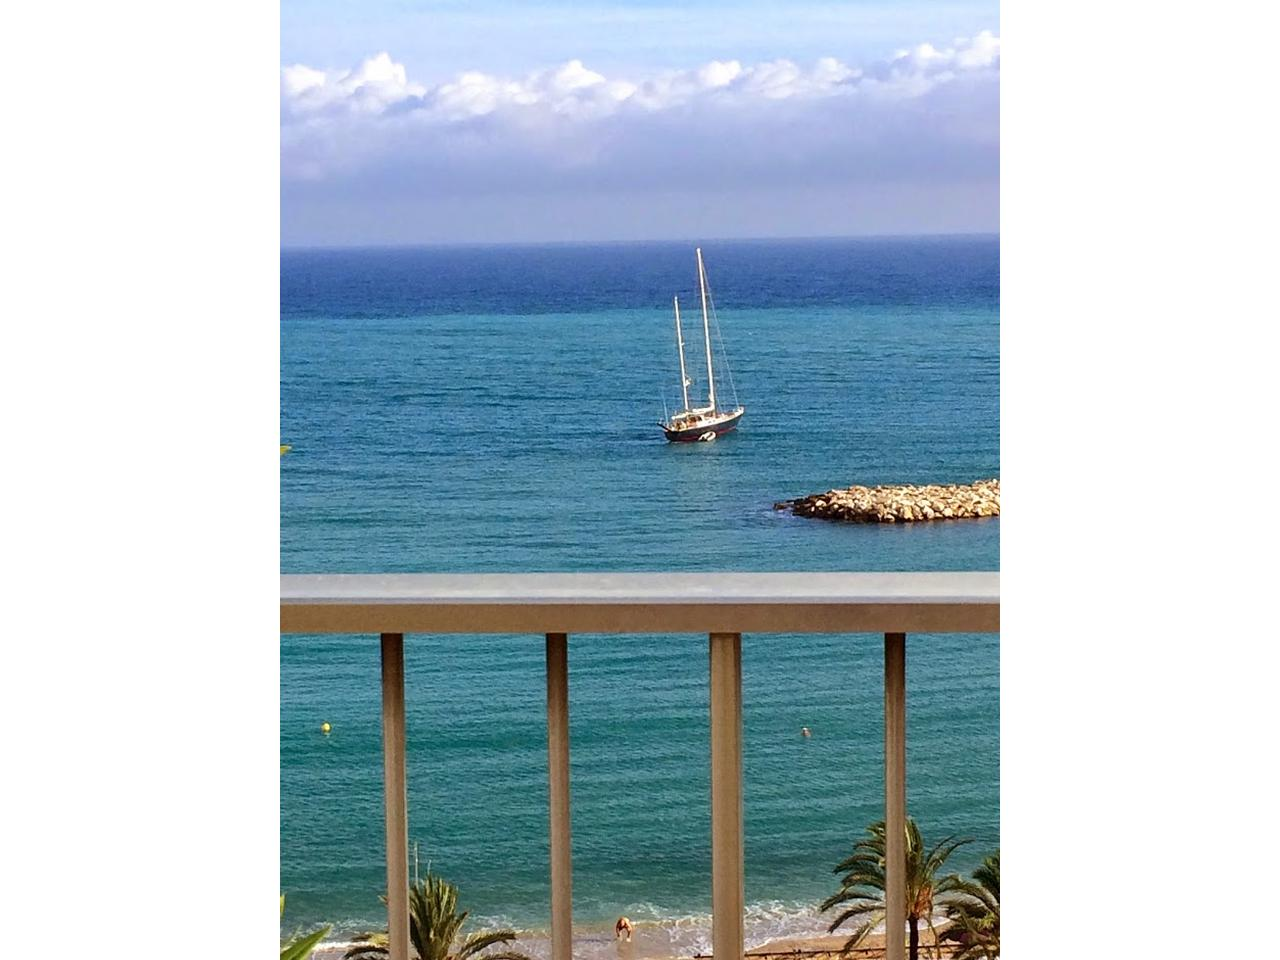 Immobilier nice vue mer appartement menton villa sur toit menton bord de mer - Mobilier bord de mer ...